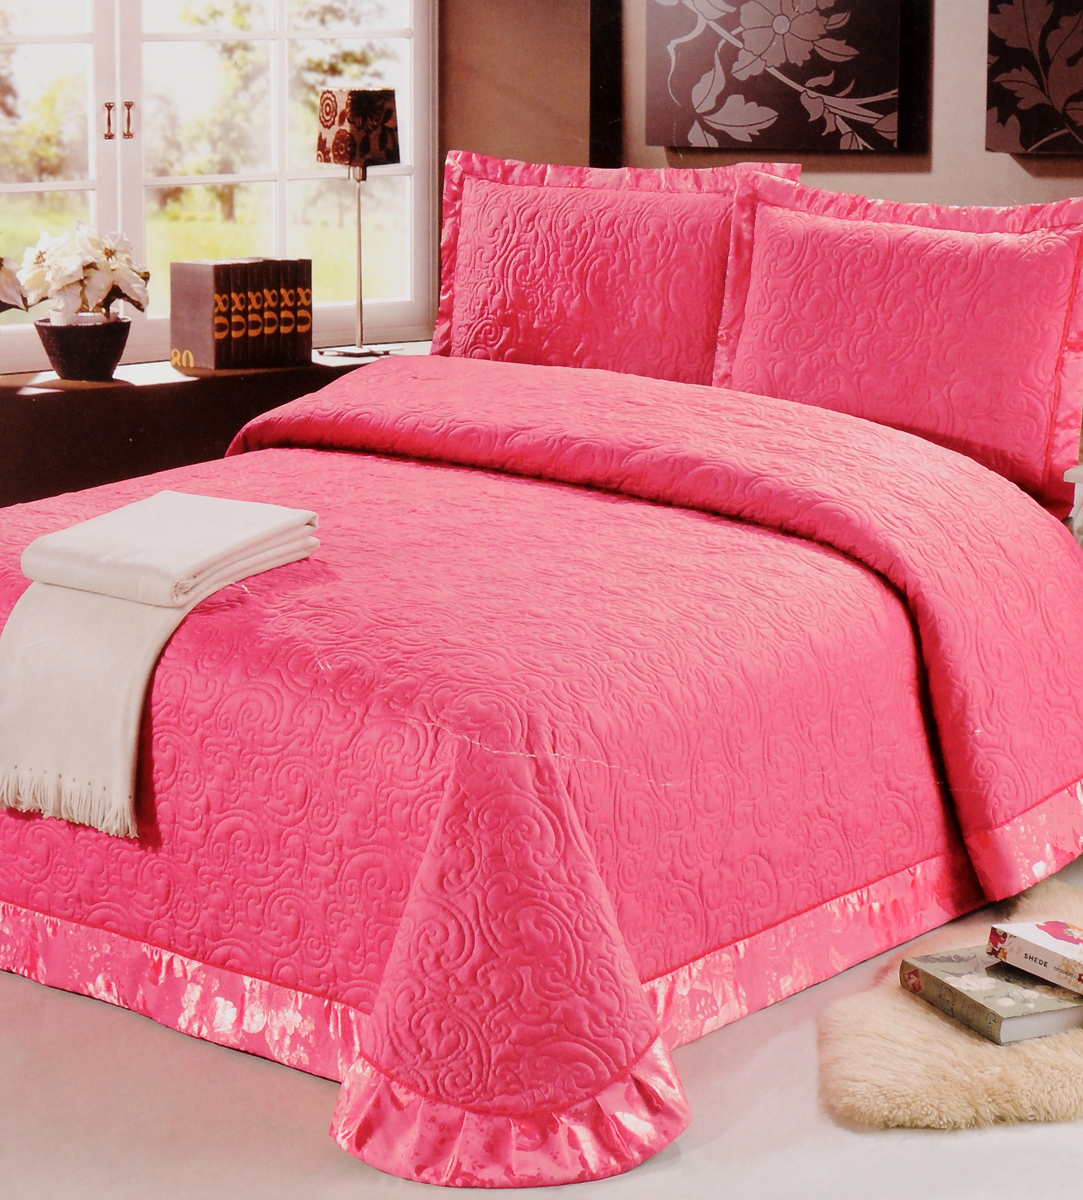 Комплект для спальни Cleo Сатин: покрывало 240 х 260 см, 2 наволочки 50 х 70 см, цвет: фуксия покрывало на кресло les gobelins mexique 50 х 120 см